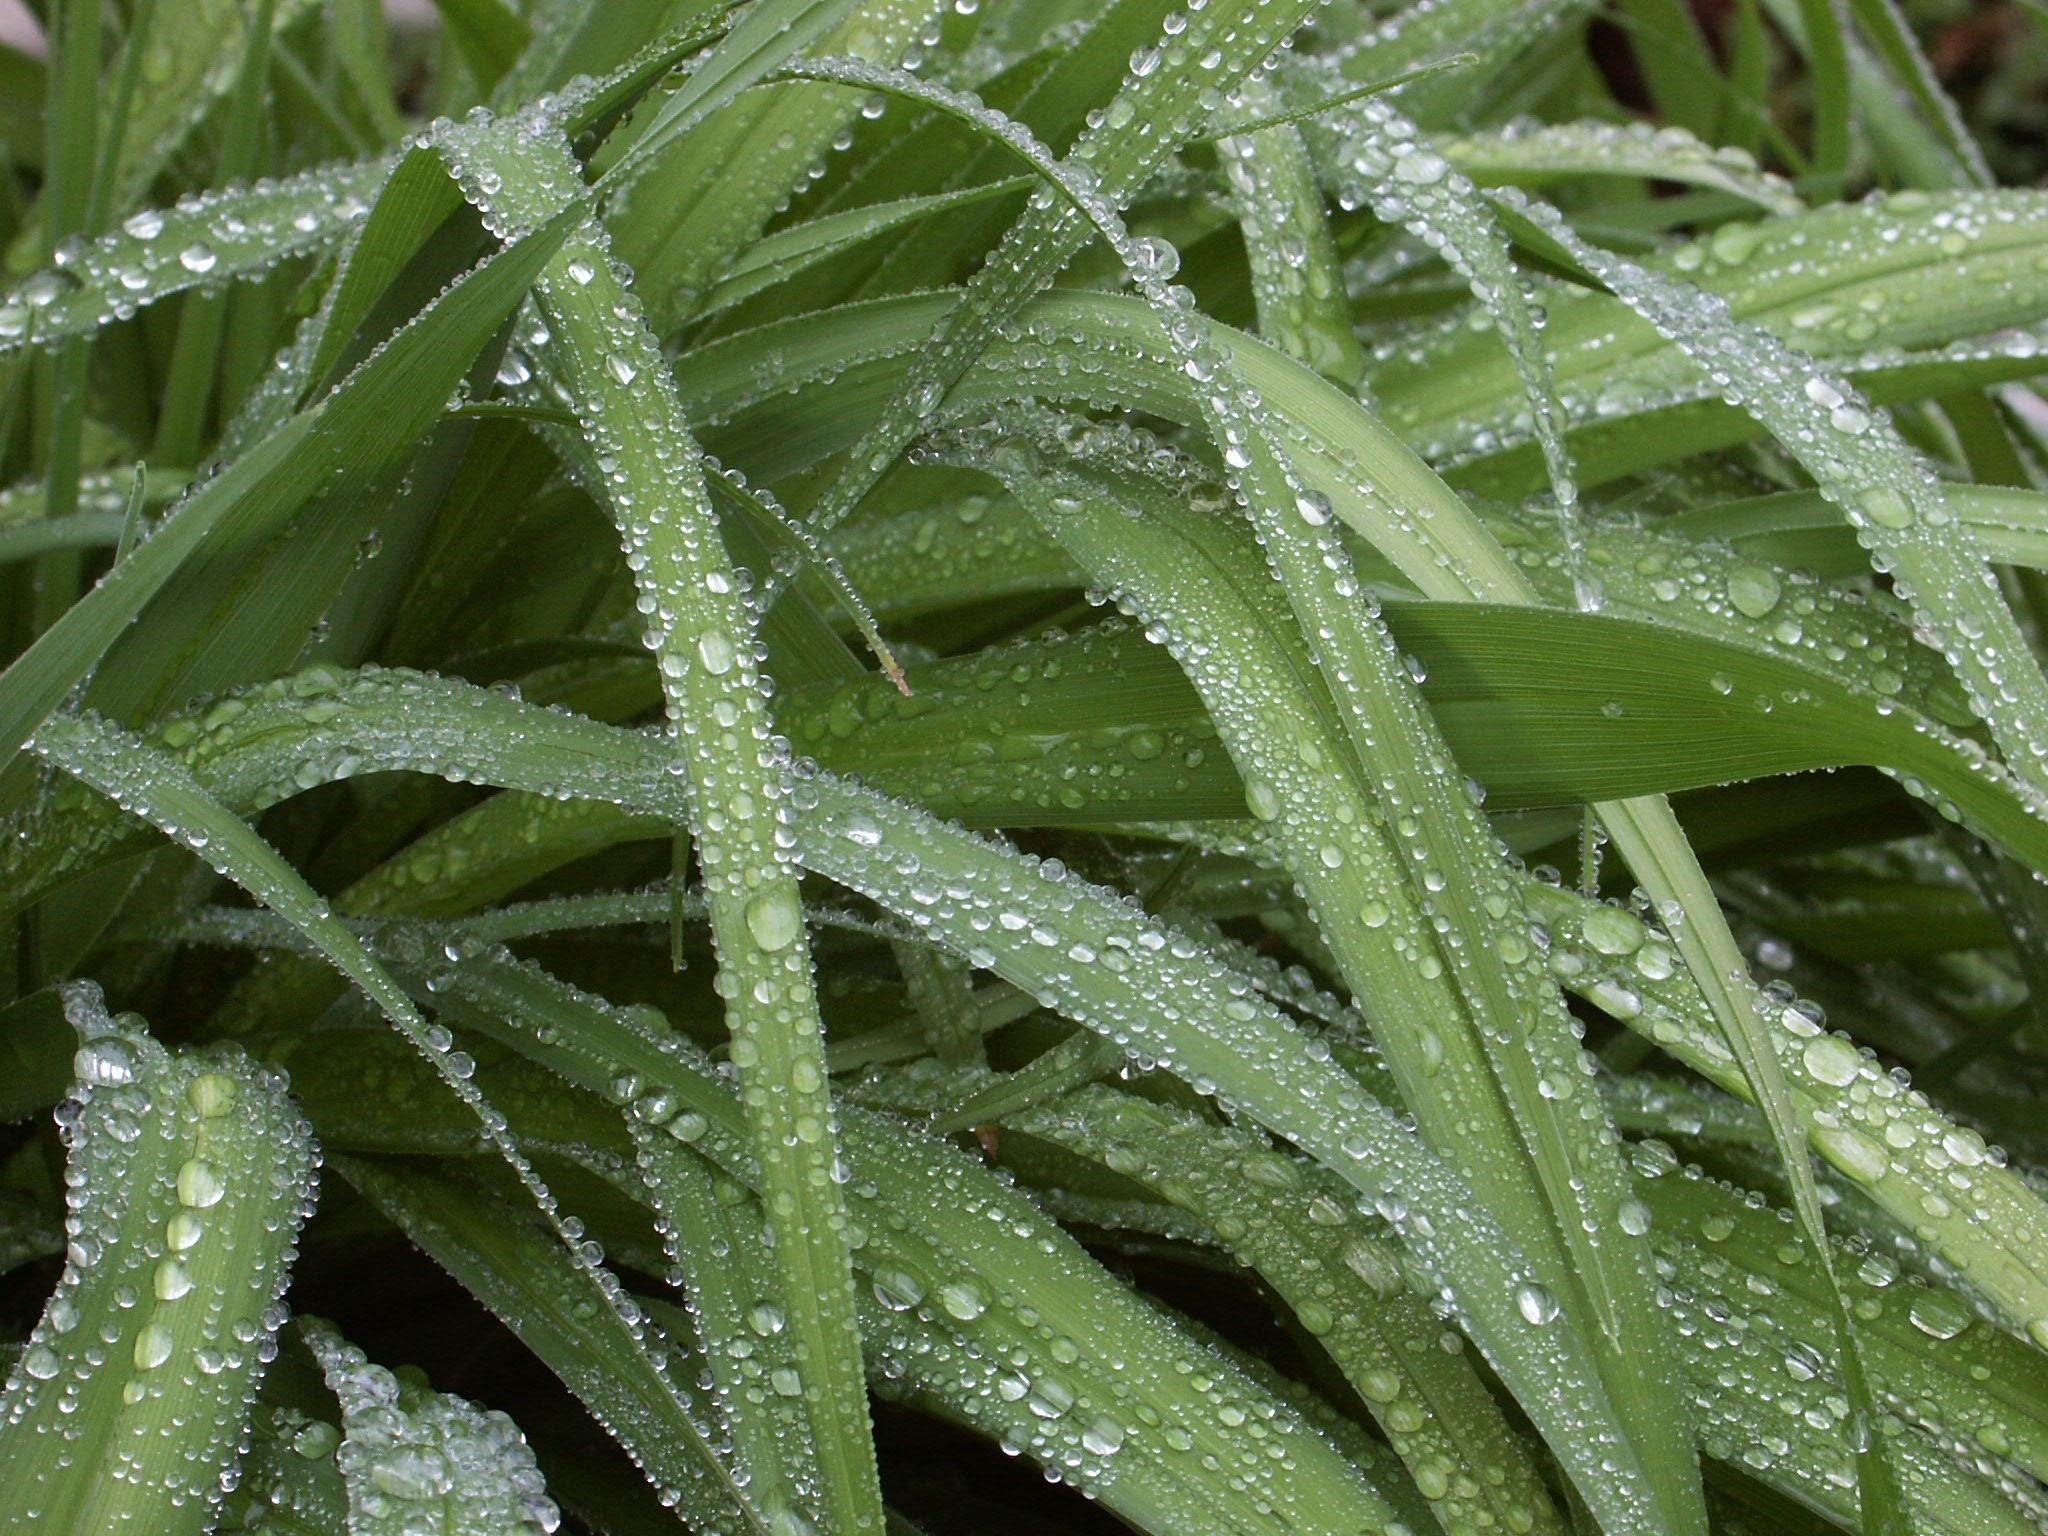 free images nature drop dew lawn morning rain leaf flower